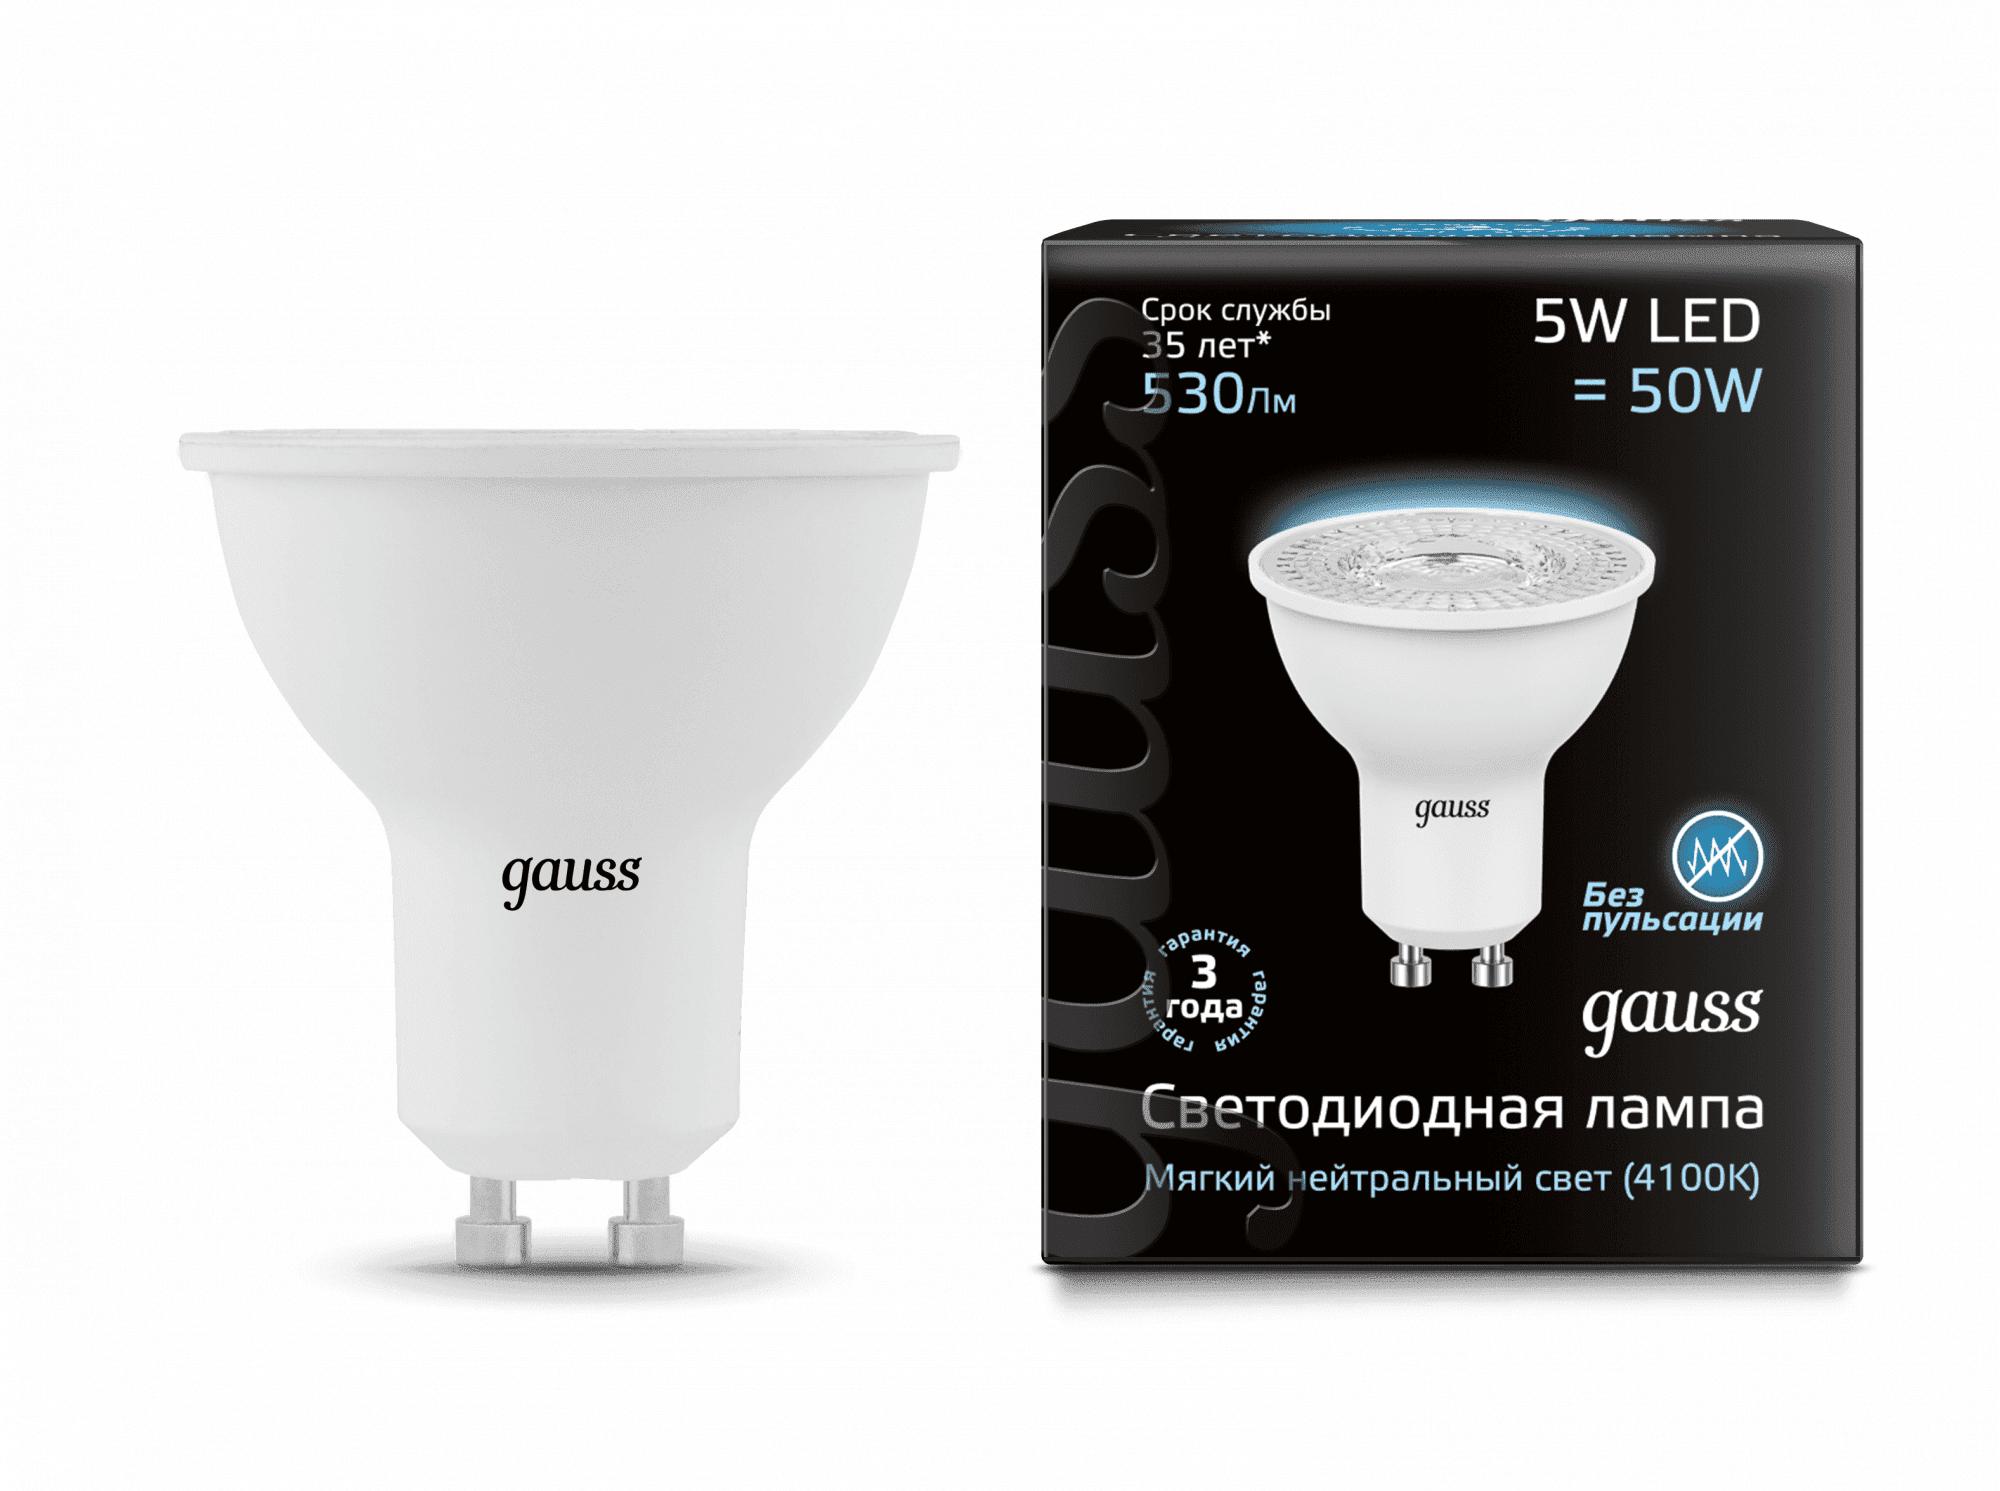 Gauss LED MR16 GU10 5W 4100K 1/10/100 арт. 101506205